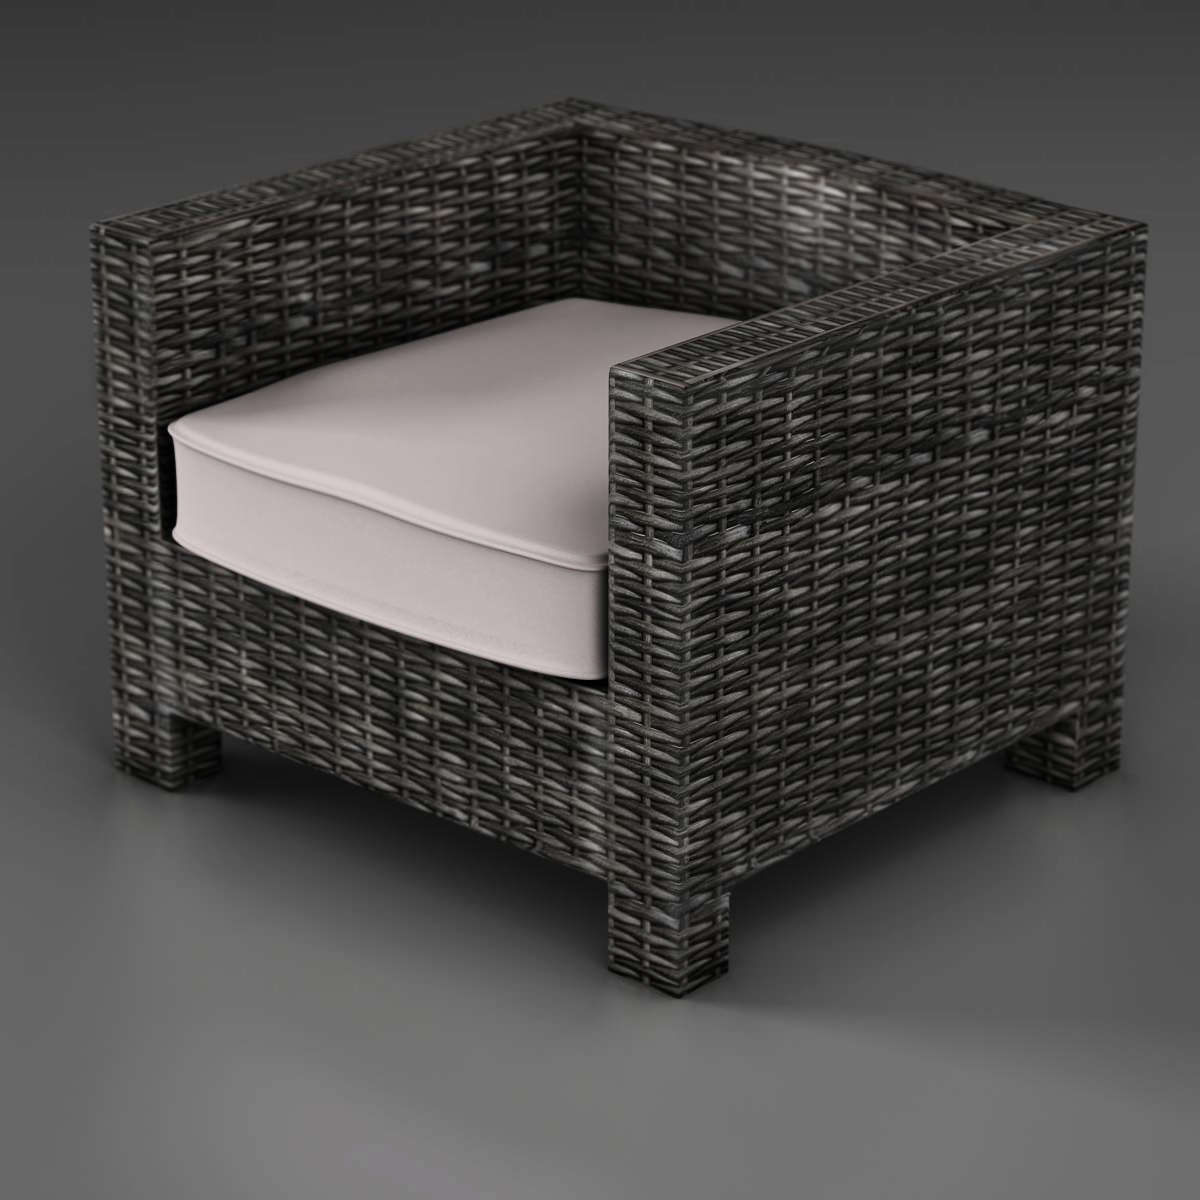 Wicker sofa 3d model 3ds max fbx c4d ma mb obj 162332